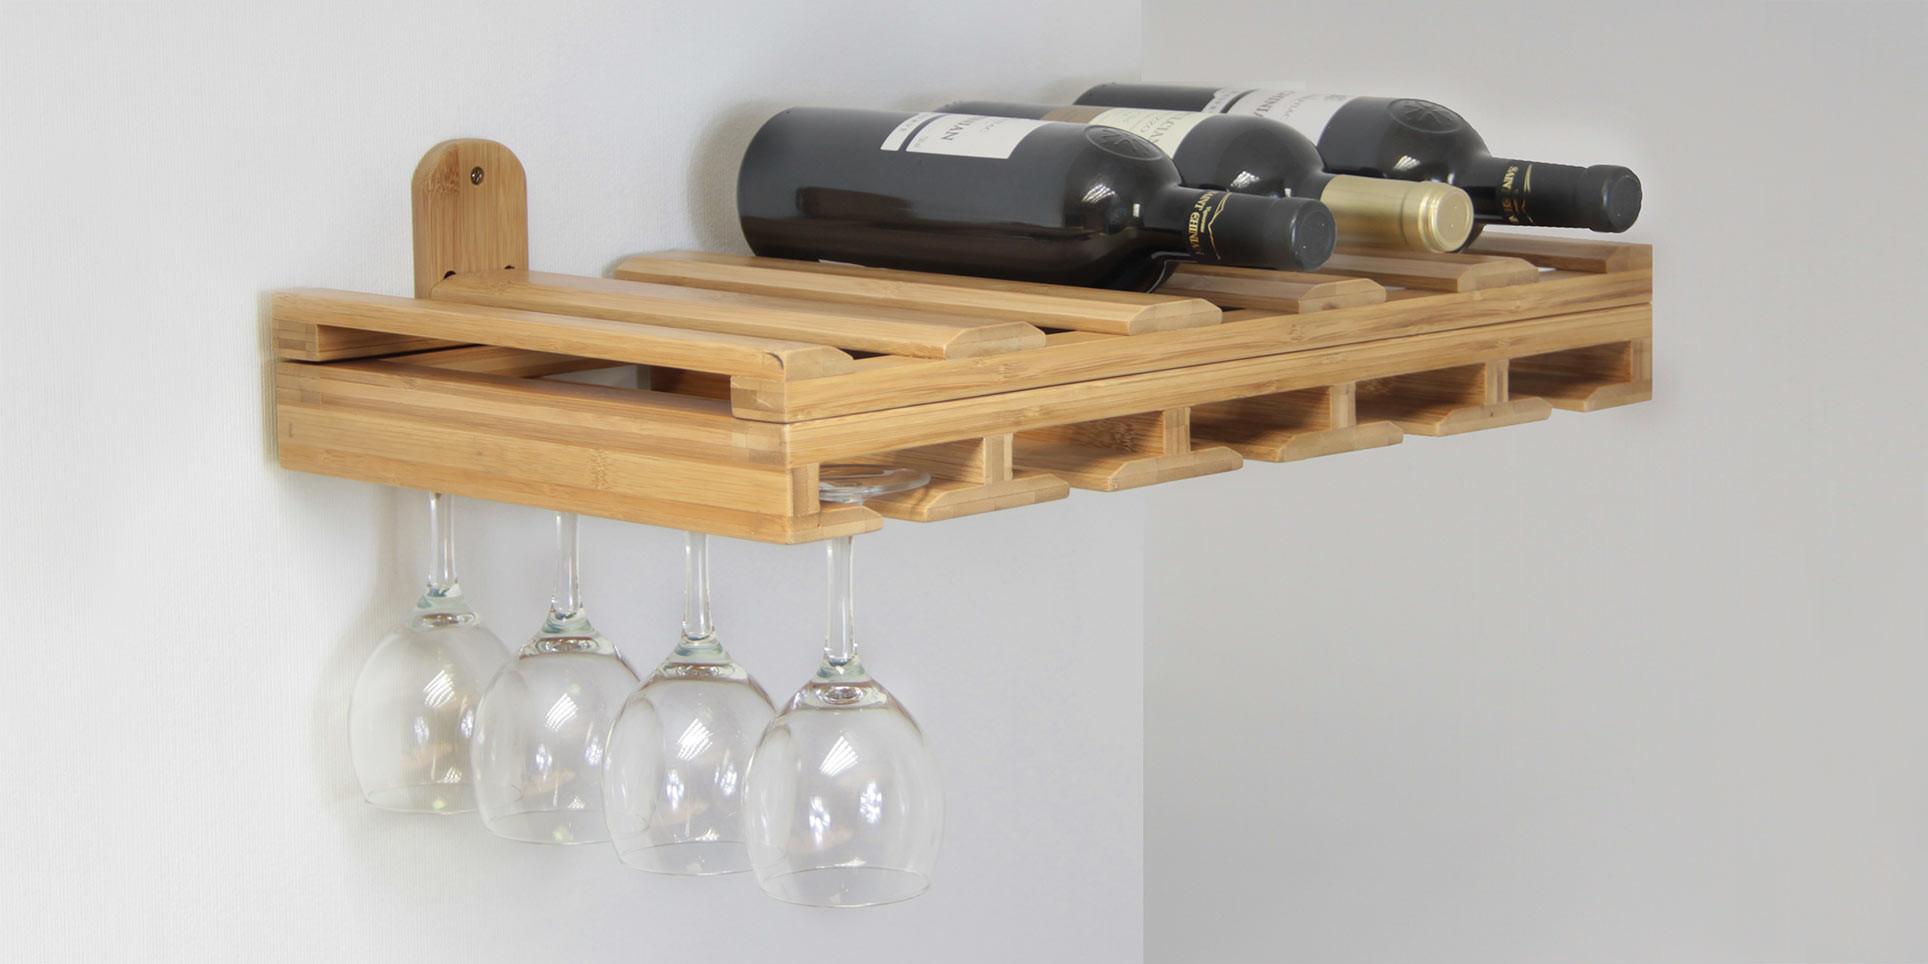 Wine Glasses & Bottles Holder | Bamboo Kitchen Storage